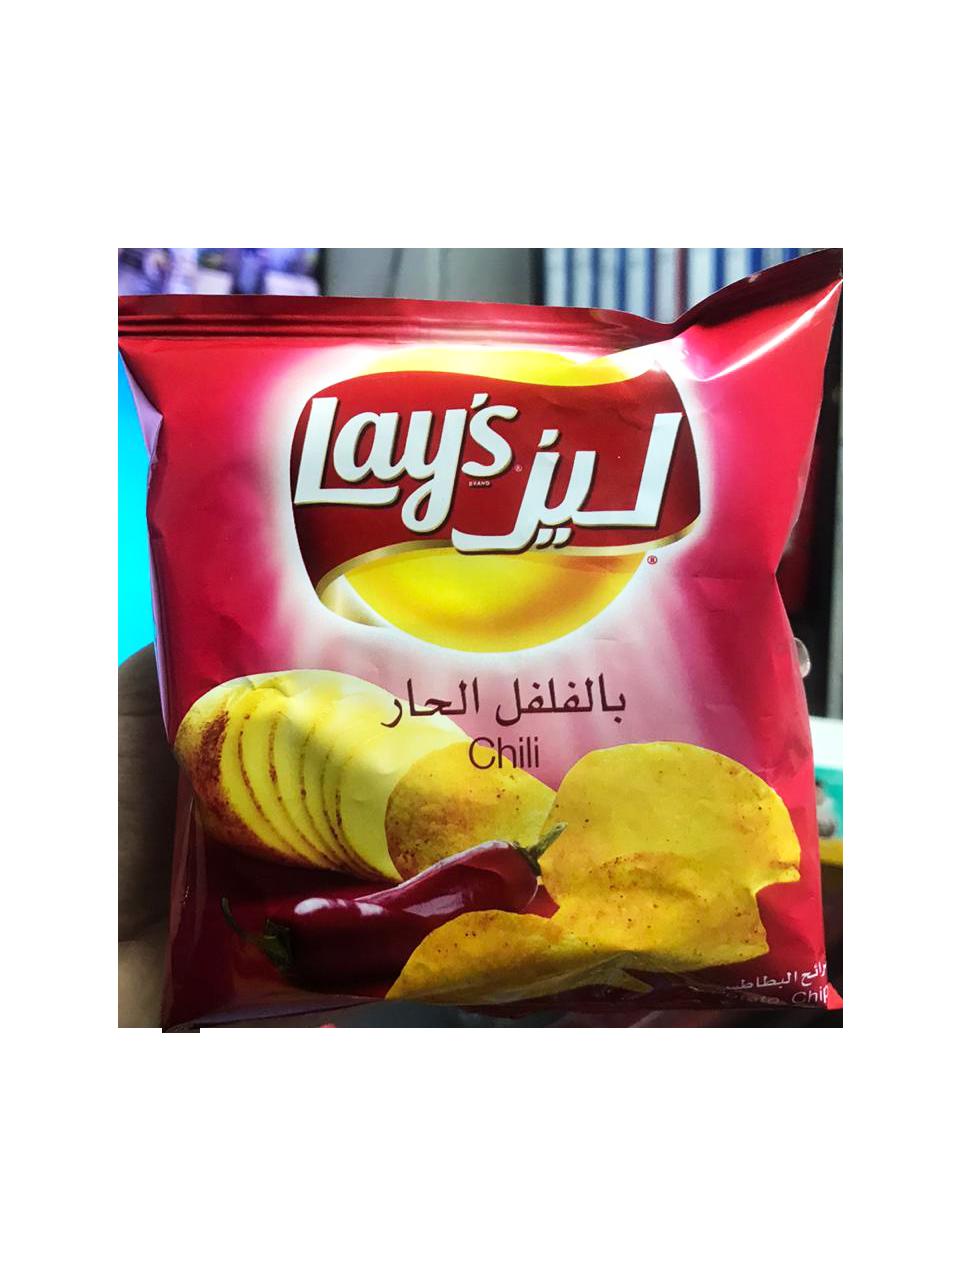 Lays Chili 14g (small)